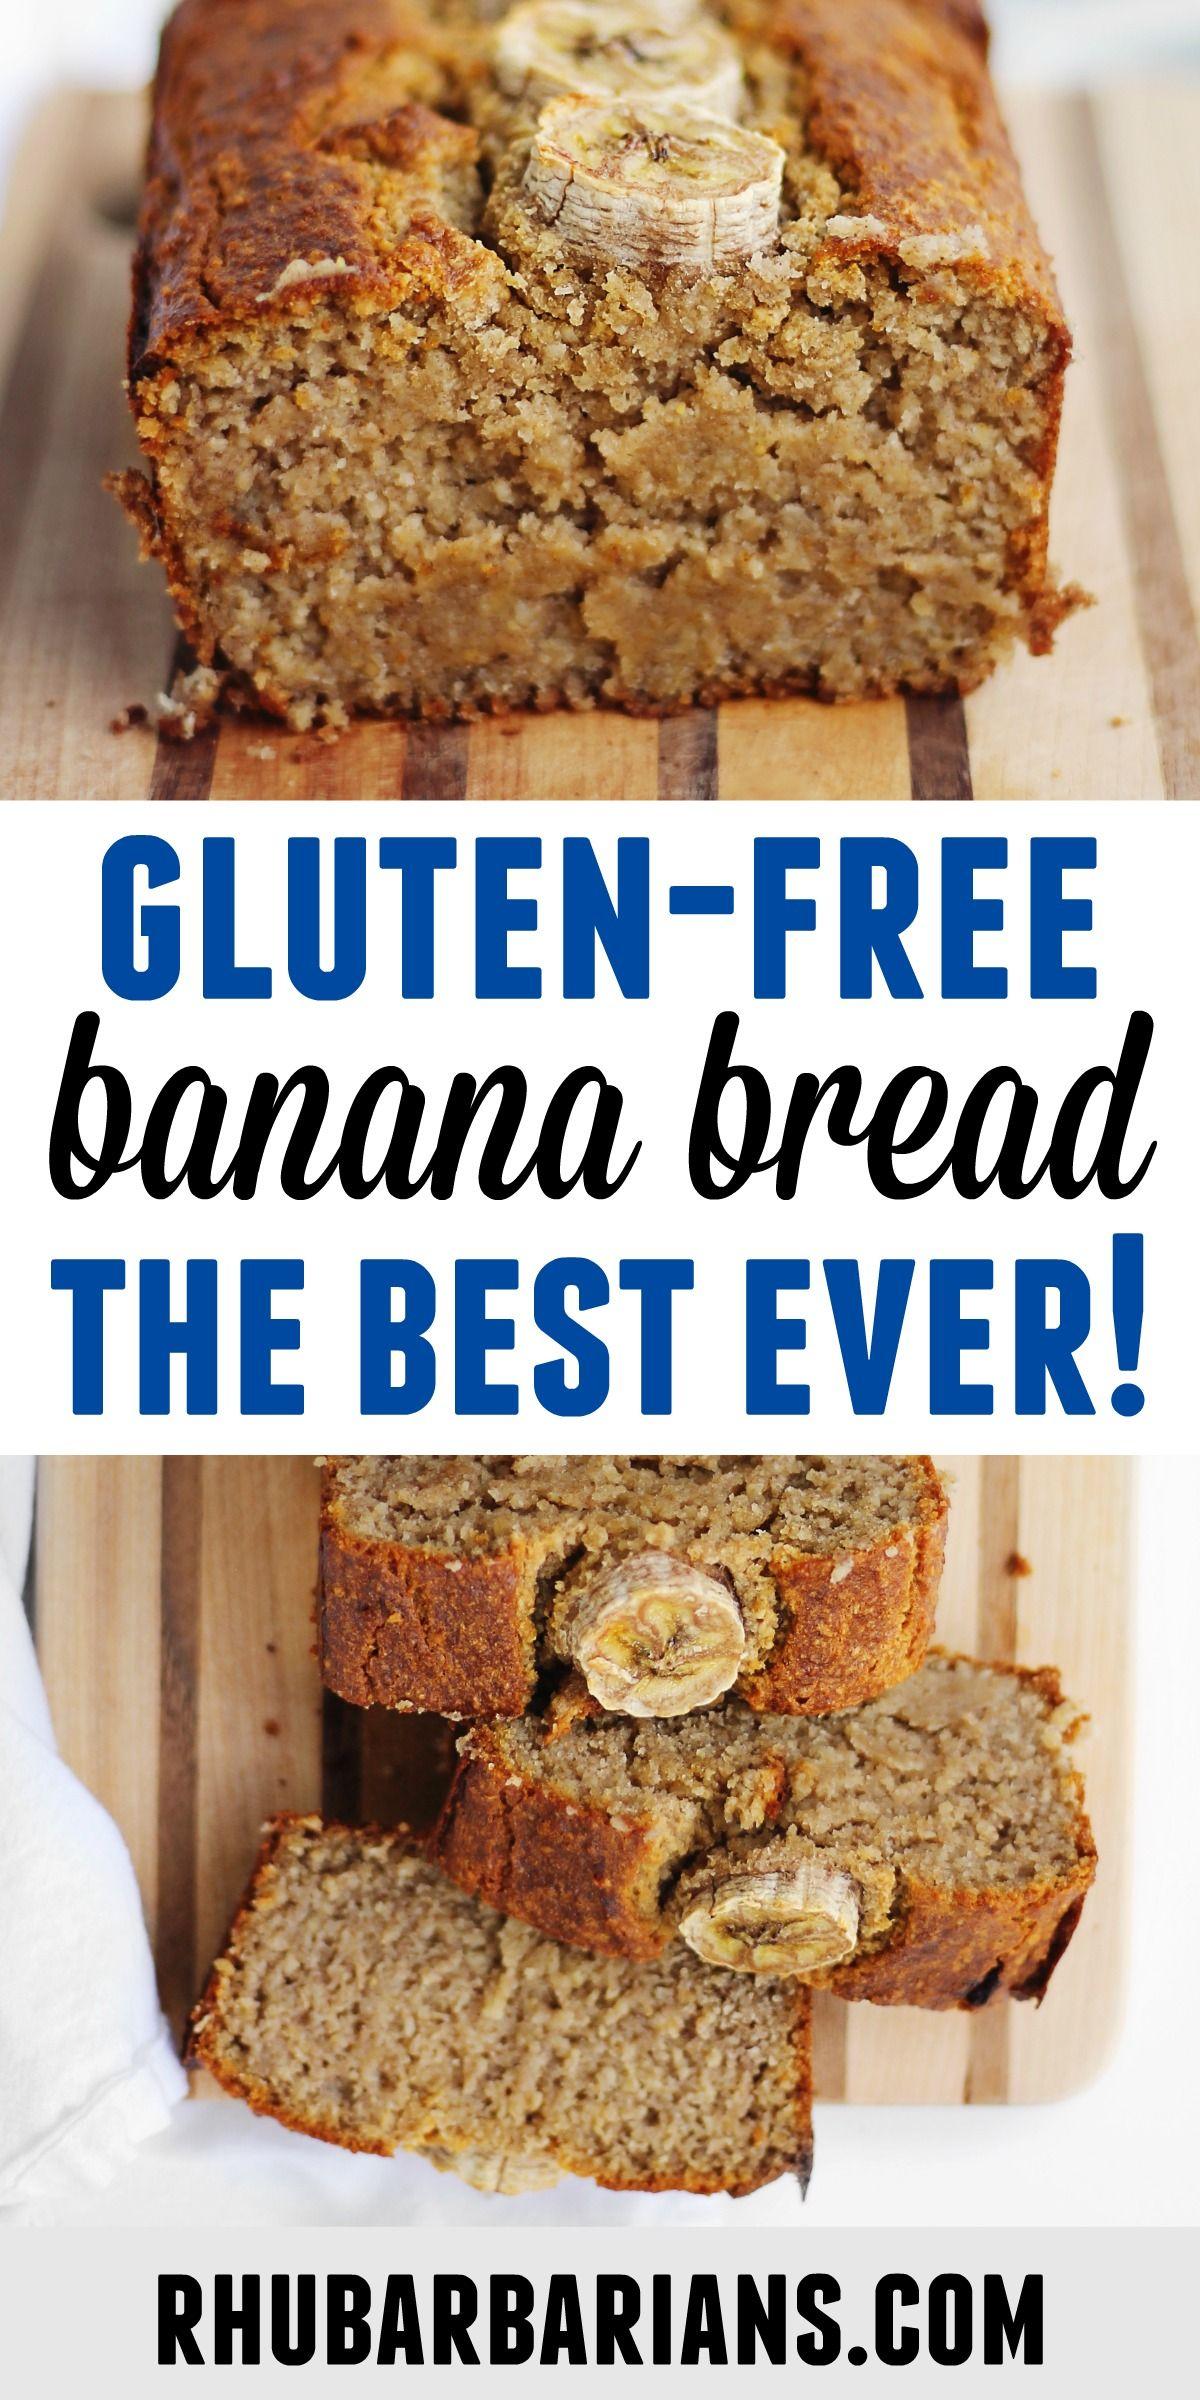 The Best Vegan Oat Flour Banana Bread Rhubarbarians Recipe In 2020 Vegan Banana Bread Recipe Baking Items Gluten Free Banana Bread